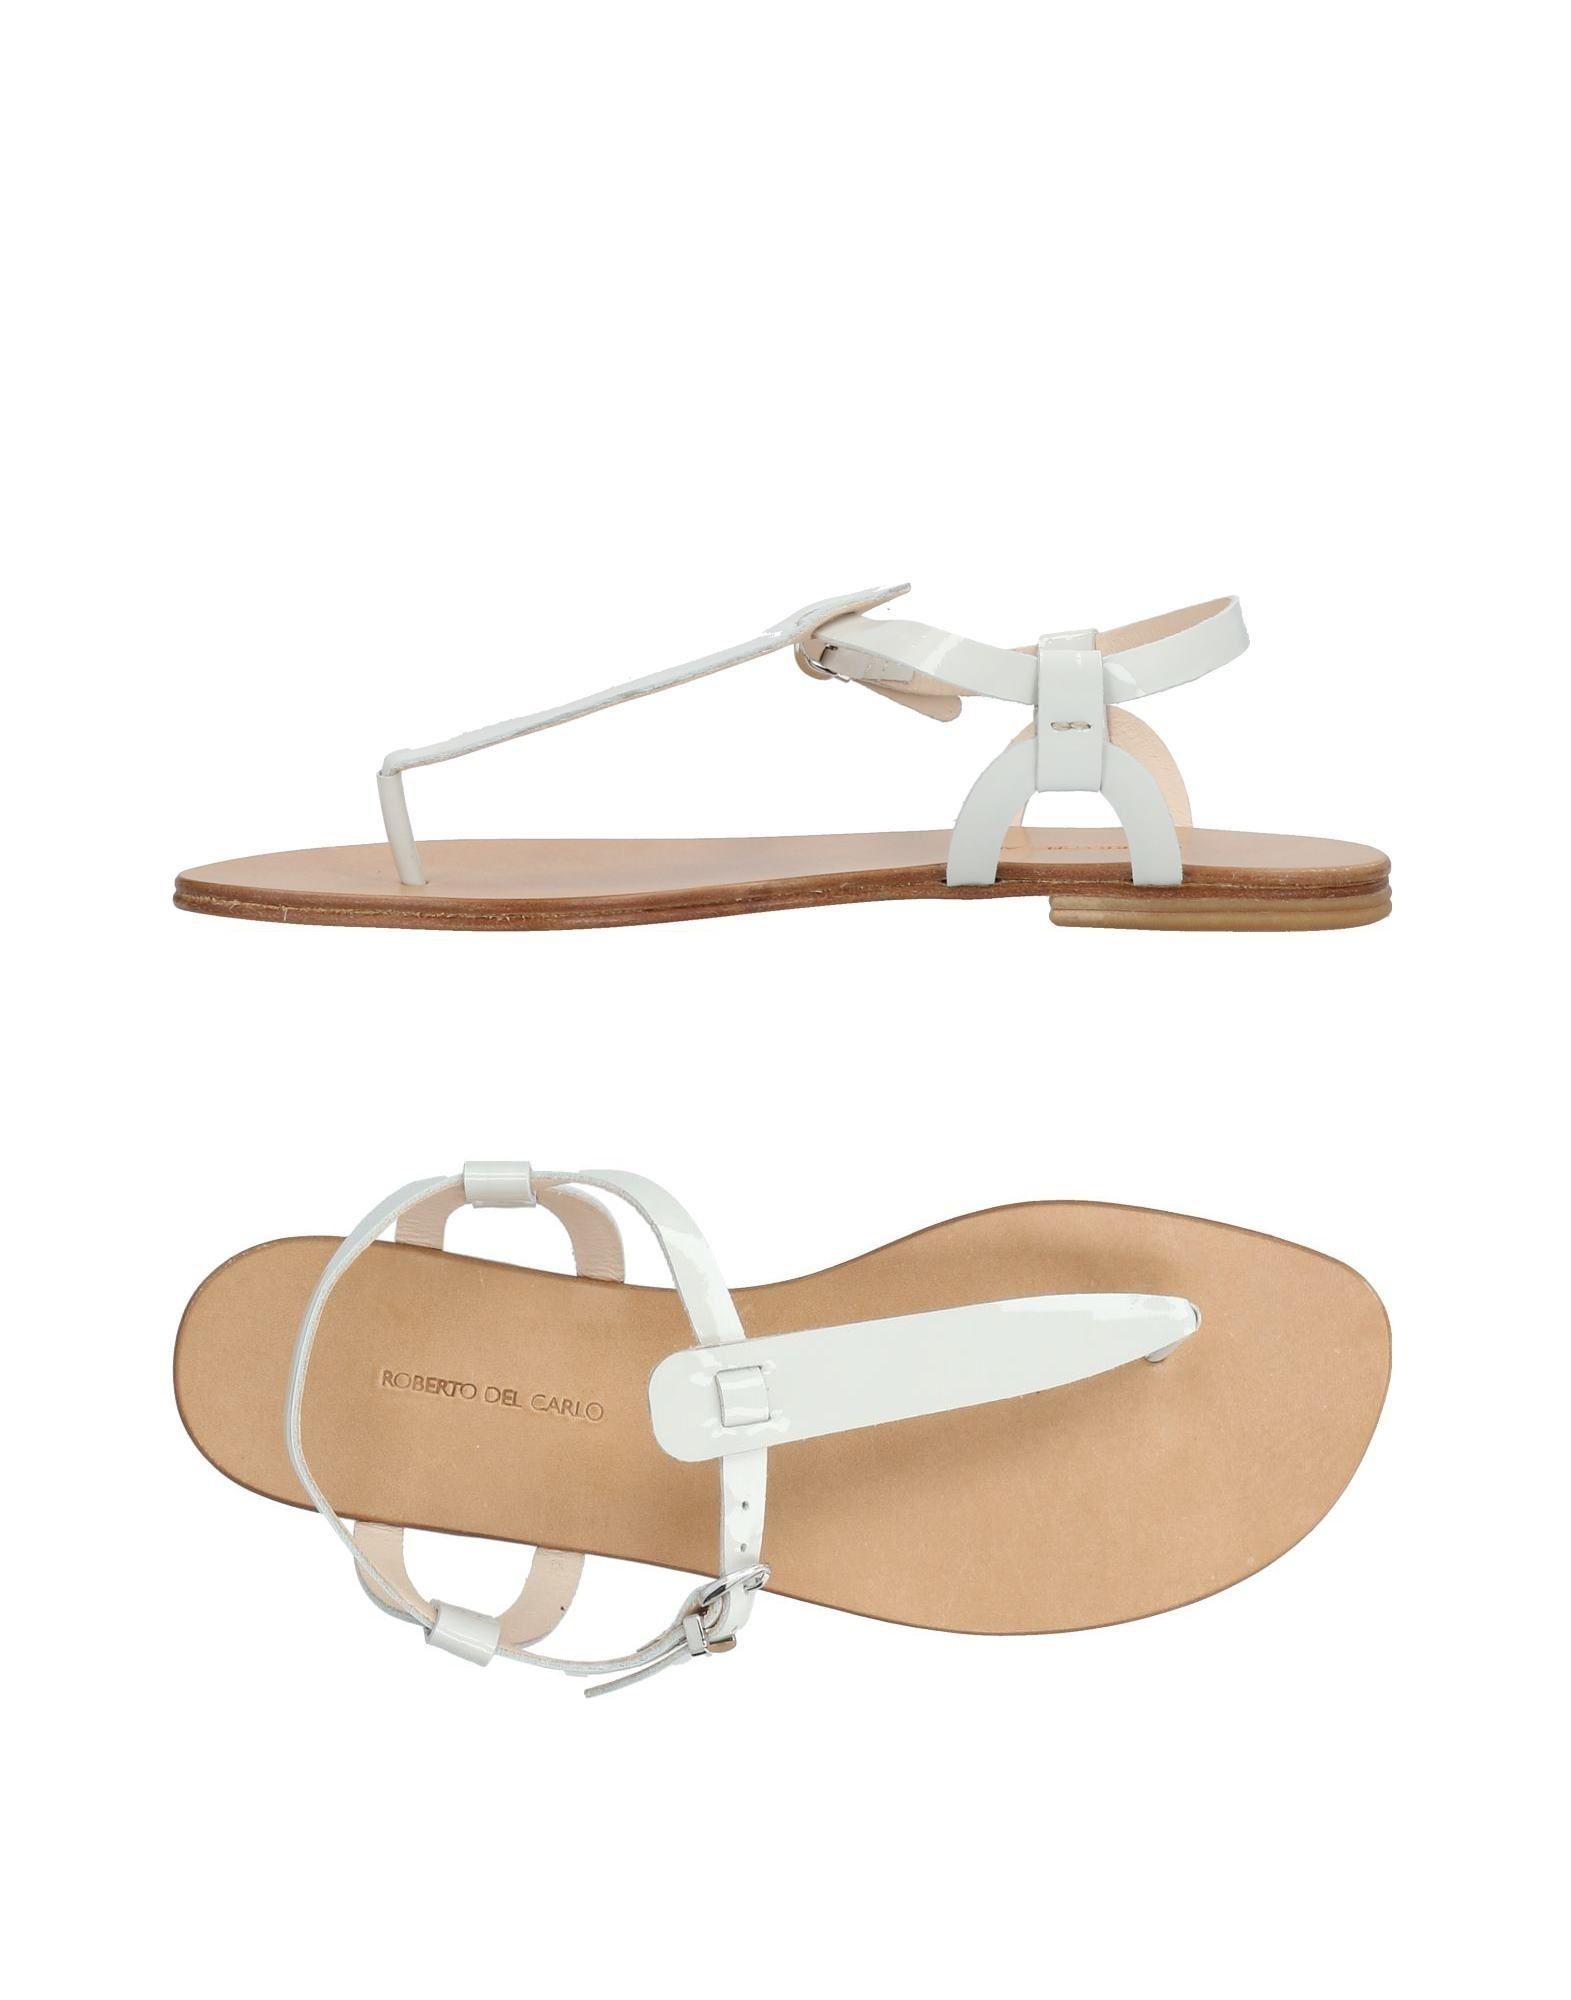 Roberto Del Carlo Dianetten Damen  11425235DV Neue Schuhe Schuhe Schuhe 1e8915